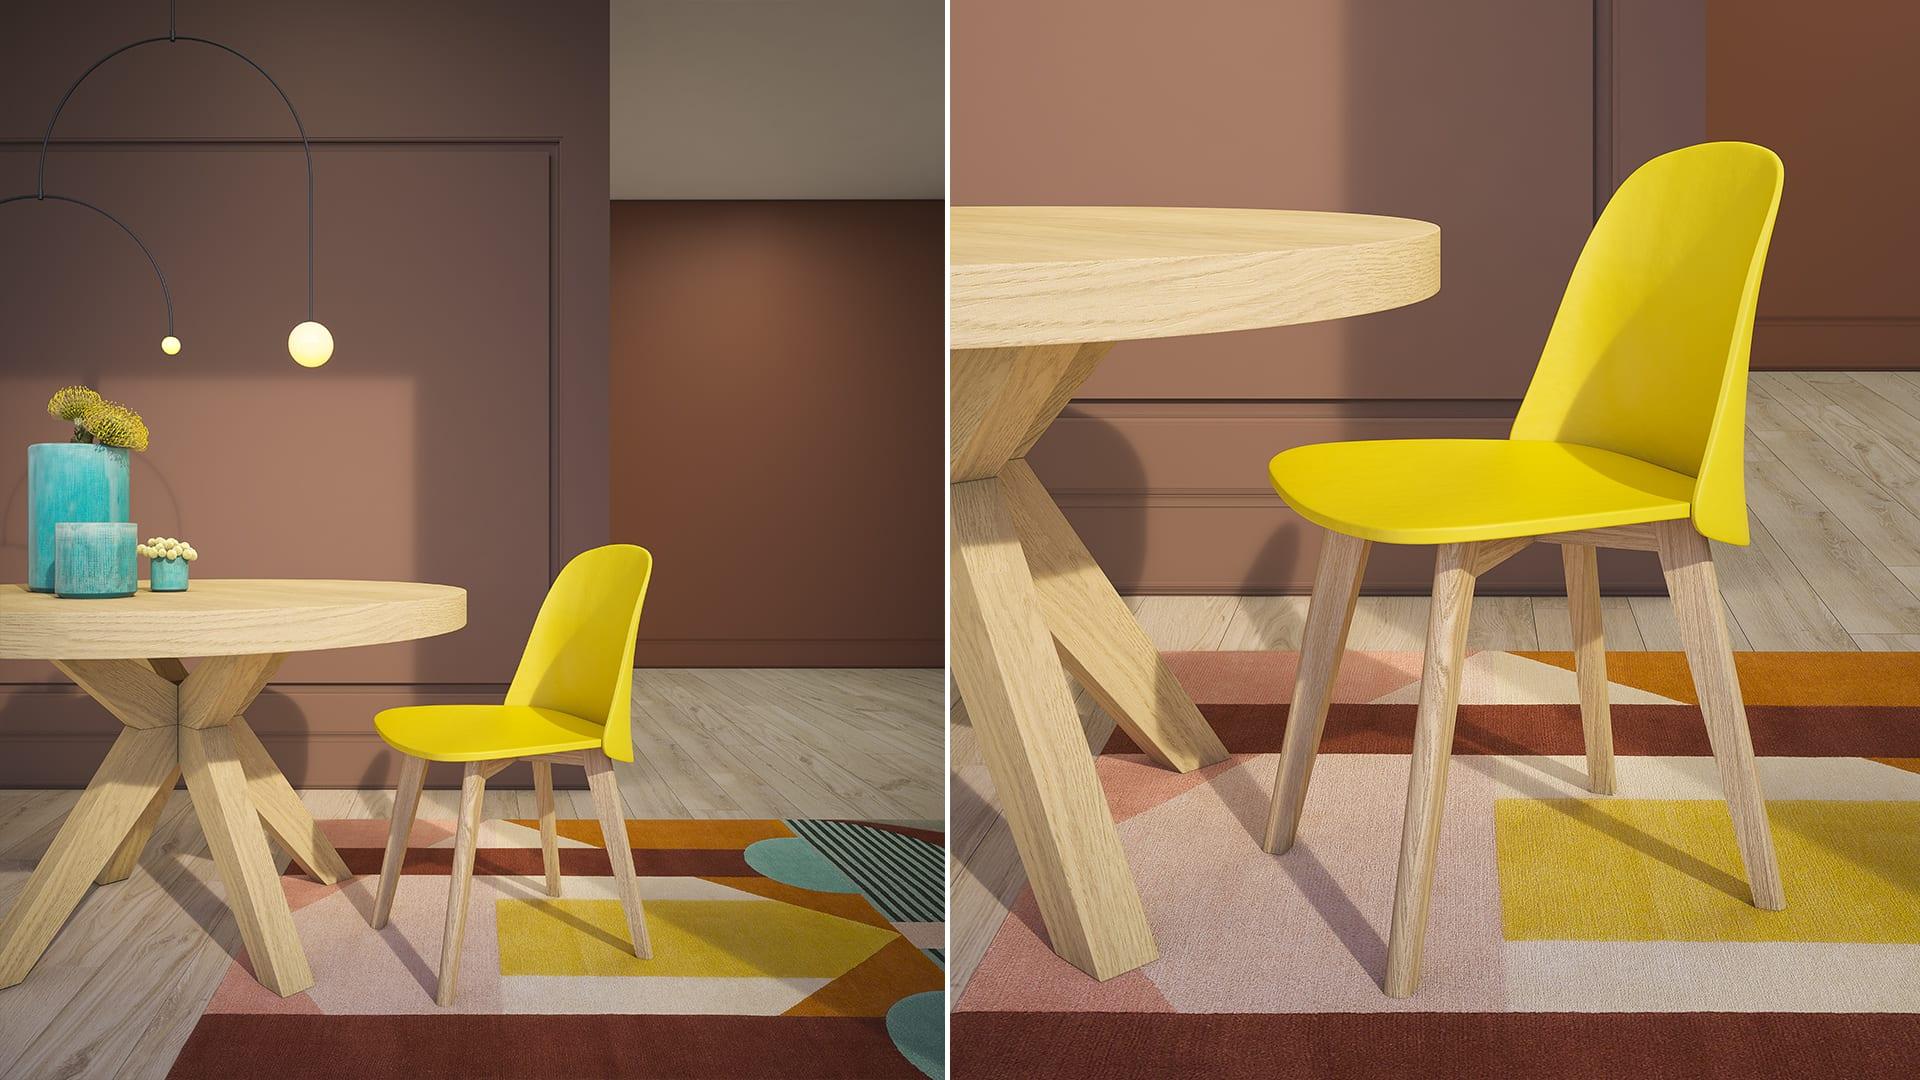 Maayan-Golan_Architectural-Visualization_3d-product-visualization_zaga-dining_14